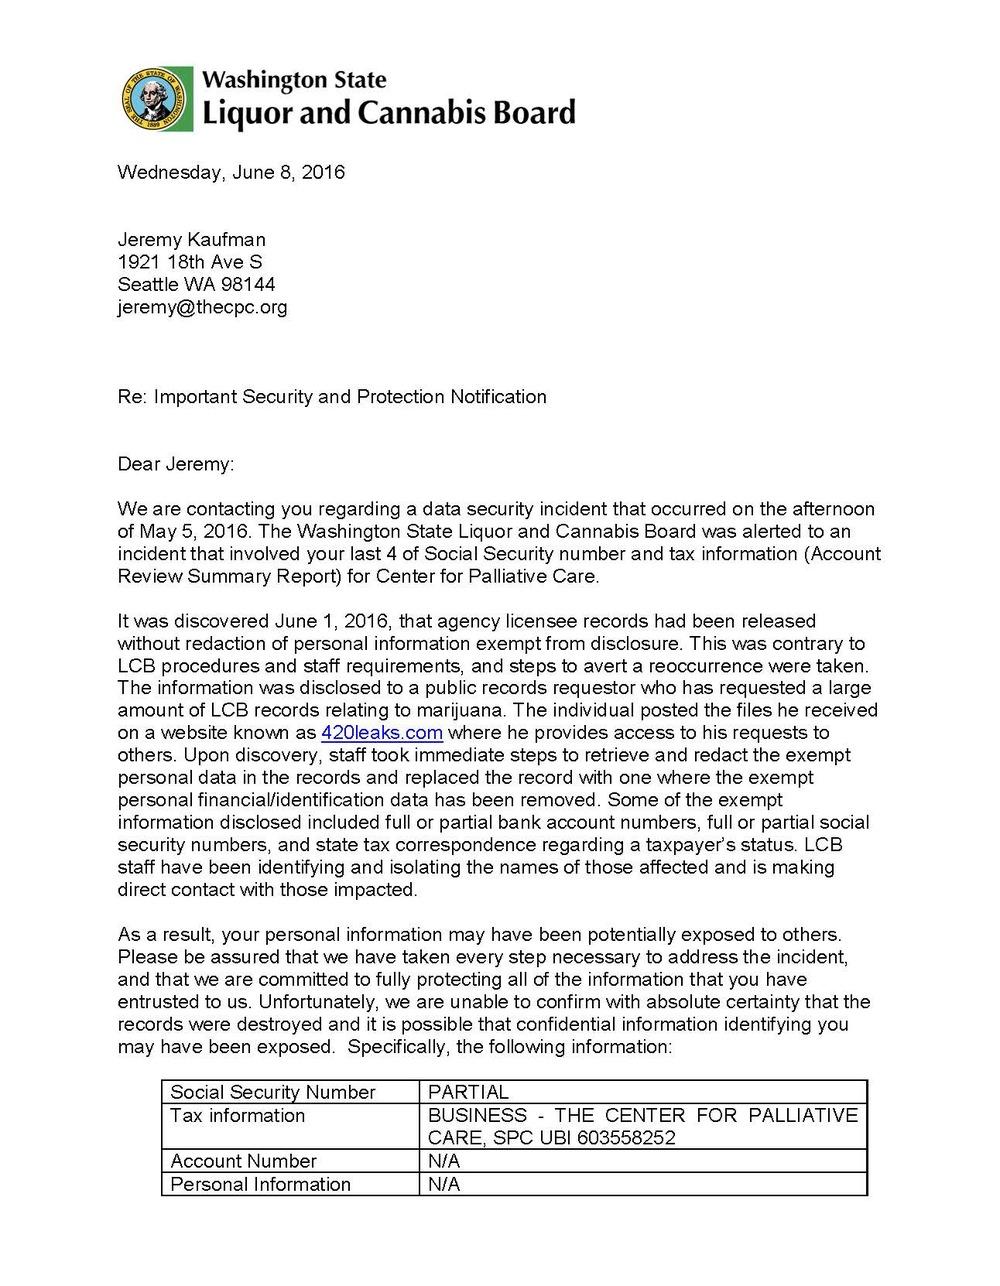 Washington Liquor and Cannabis board data breach letter to Jeremy Kaufman